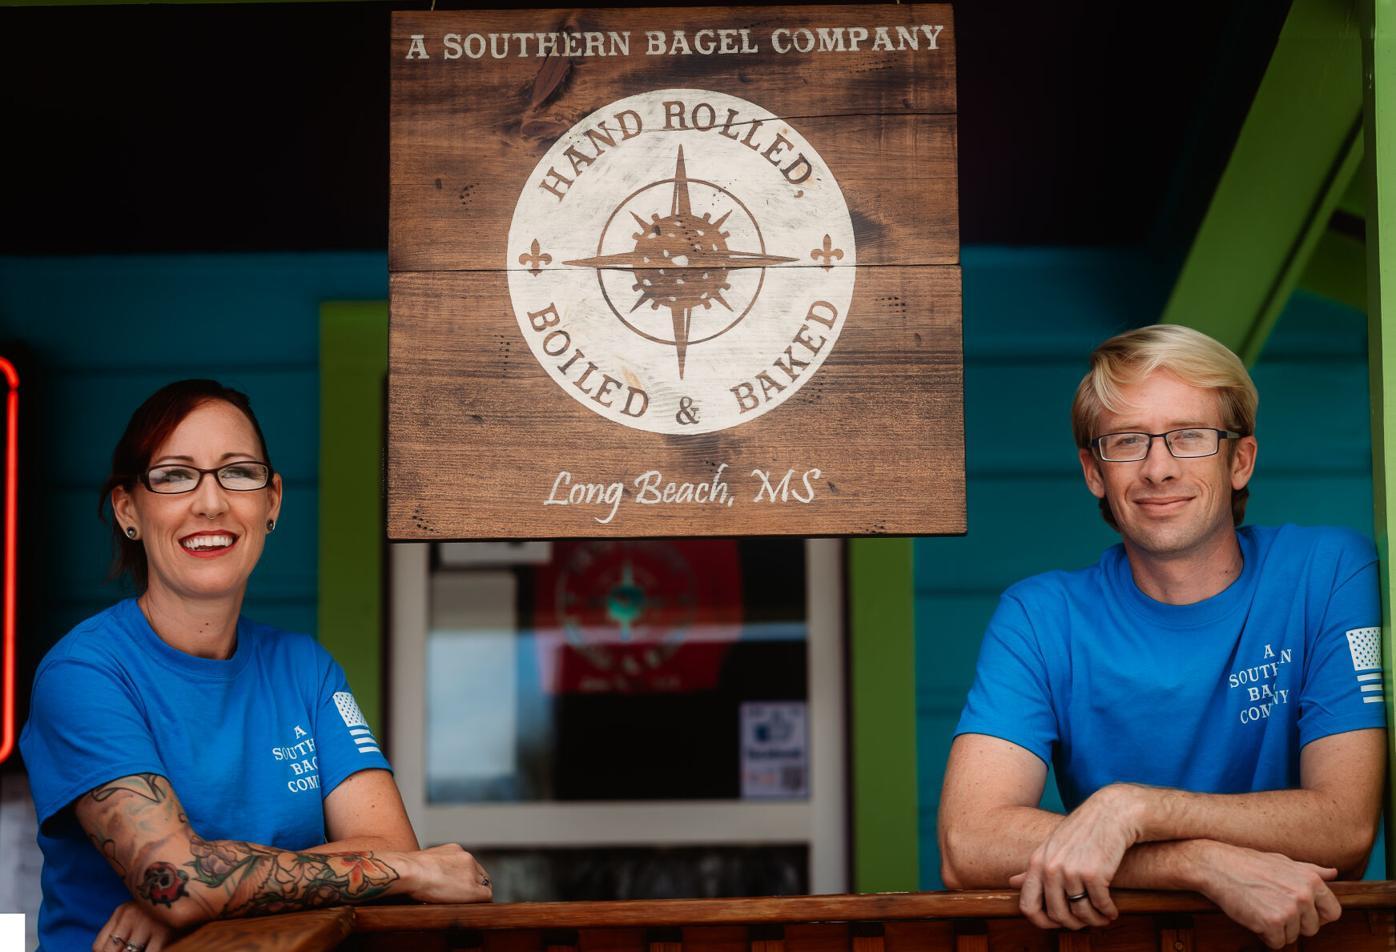 Southern Bagel Company